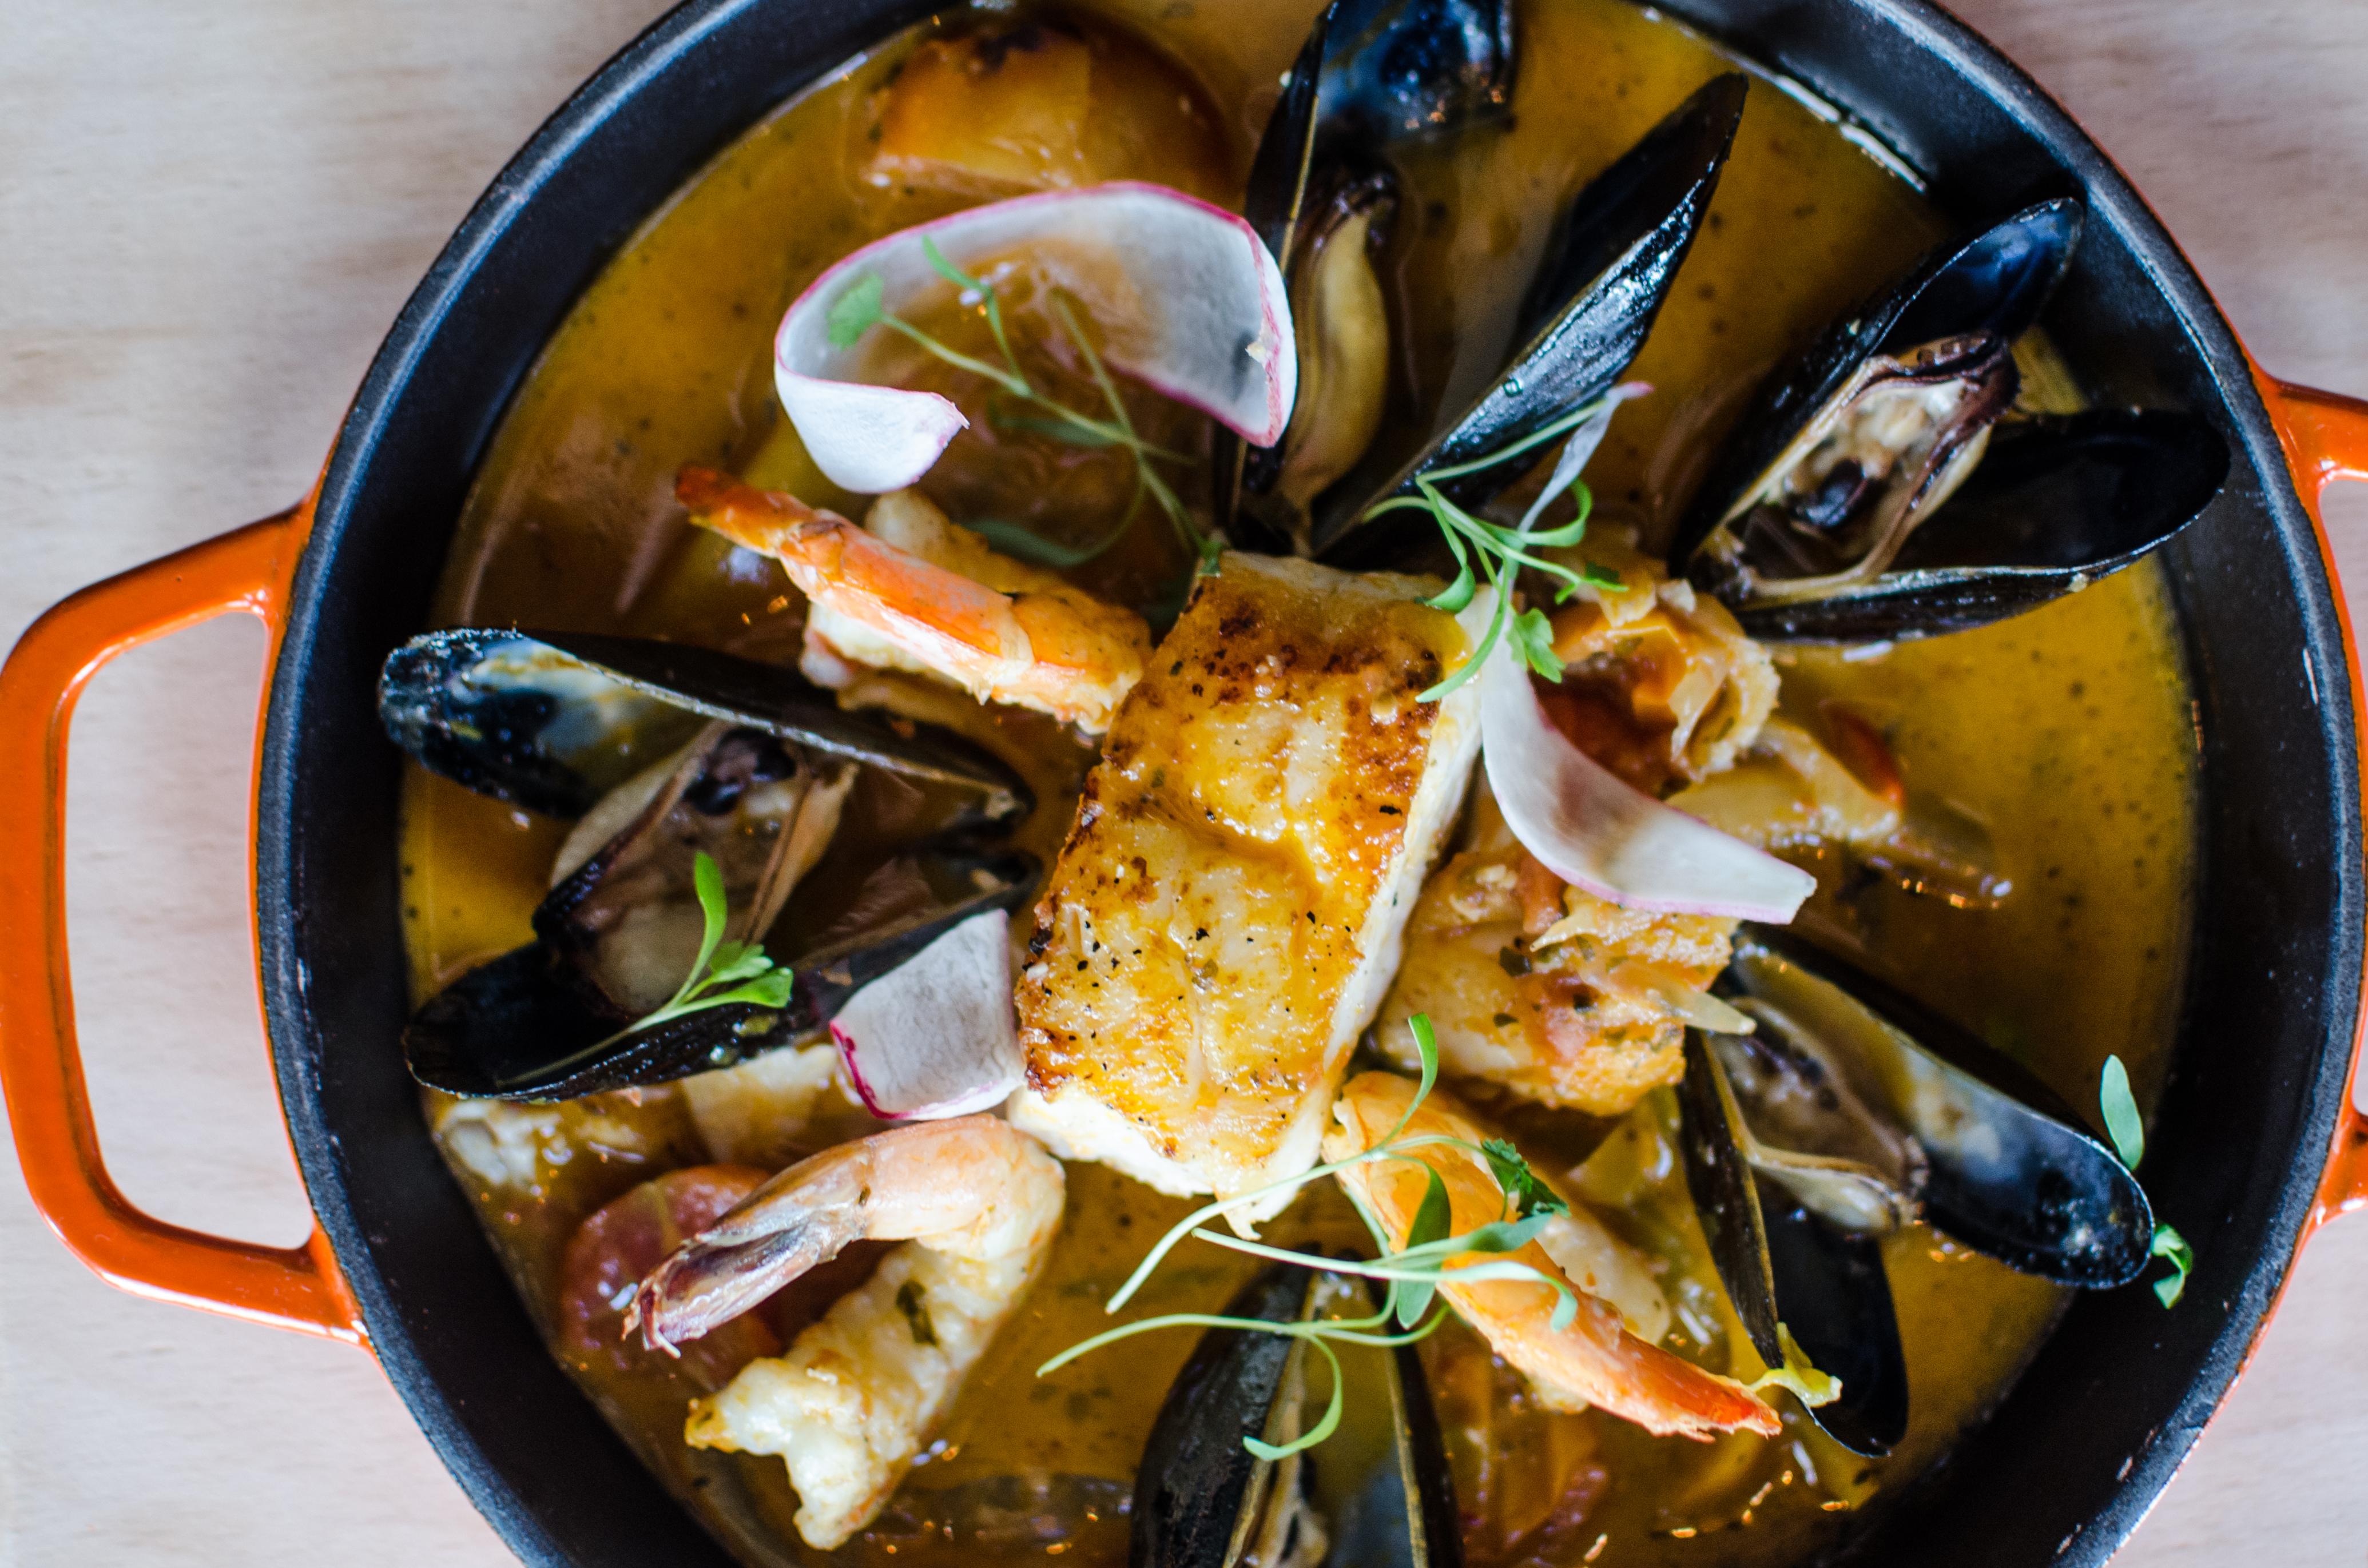 Casa Caña's enchilado de pescado: shrimp, mussel, and fish stew with tomatoes, cilantro, coconut, and citrus broth